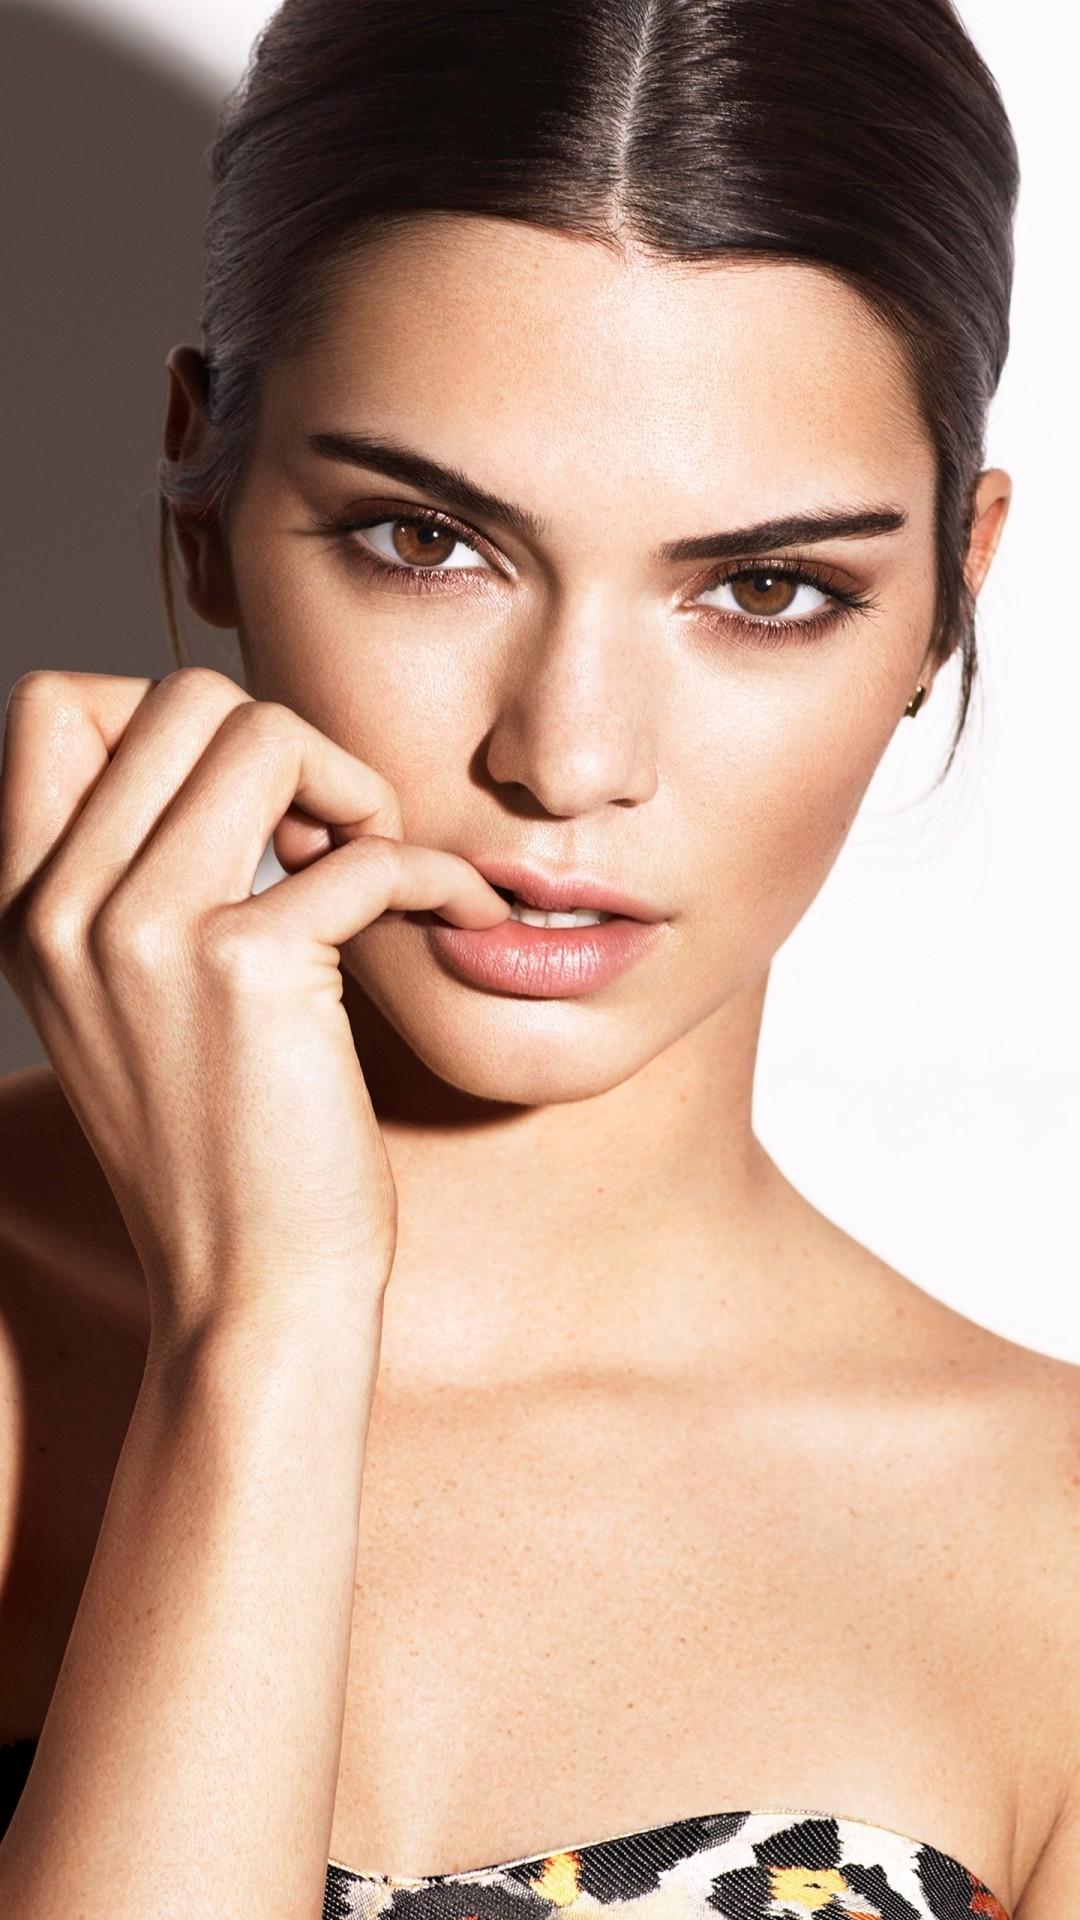 Kendall Jenner iphone 5 wallpaper